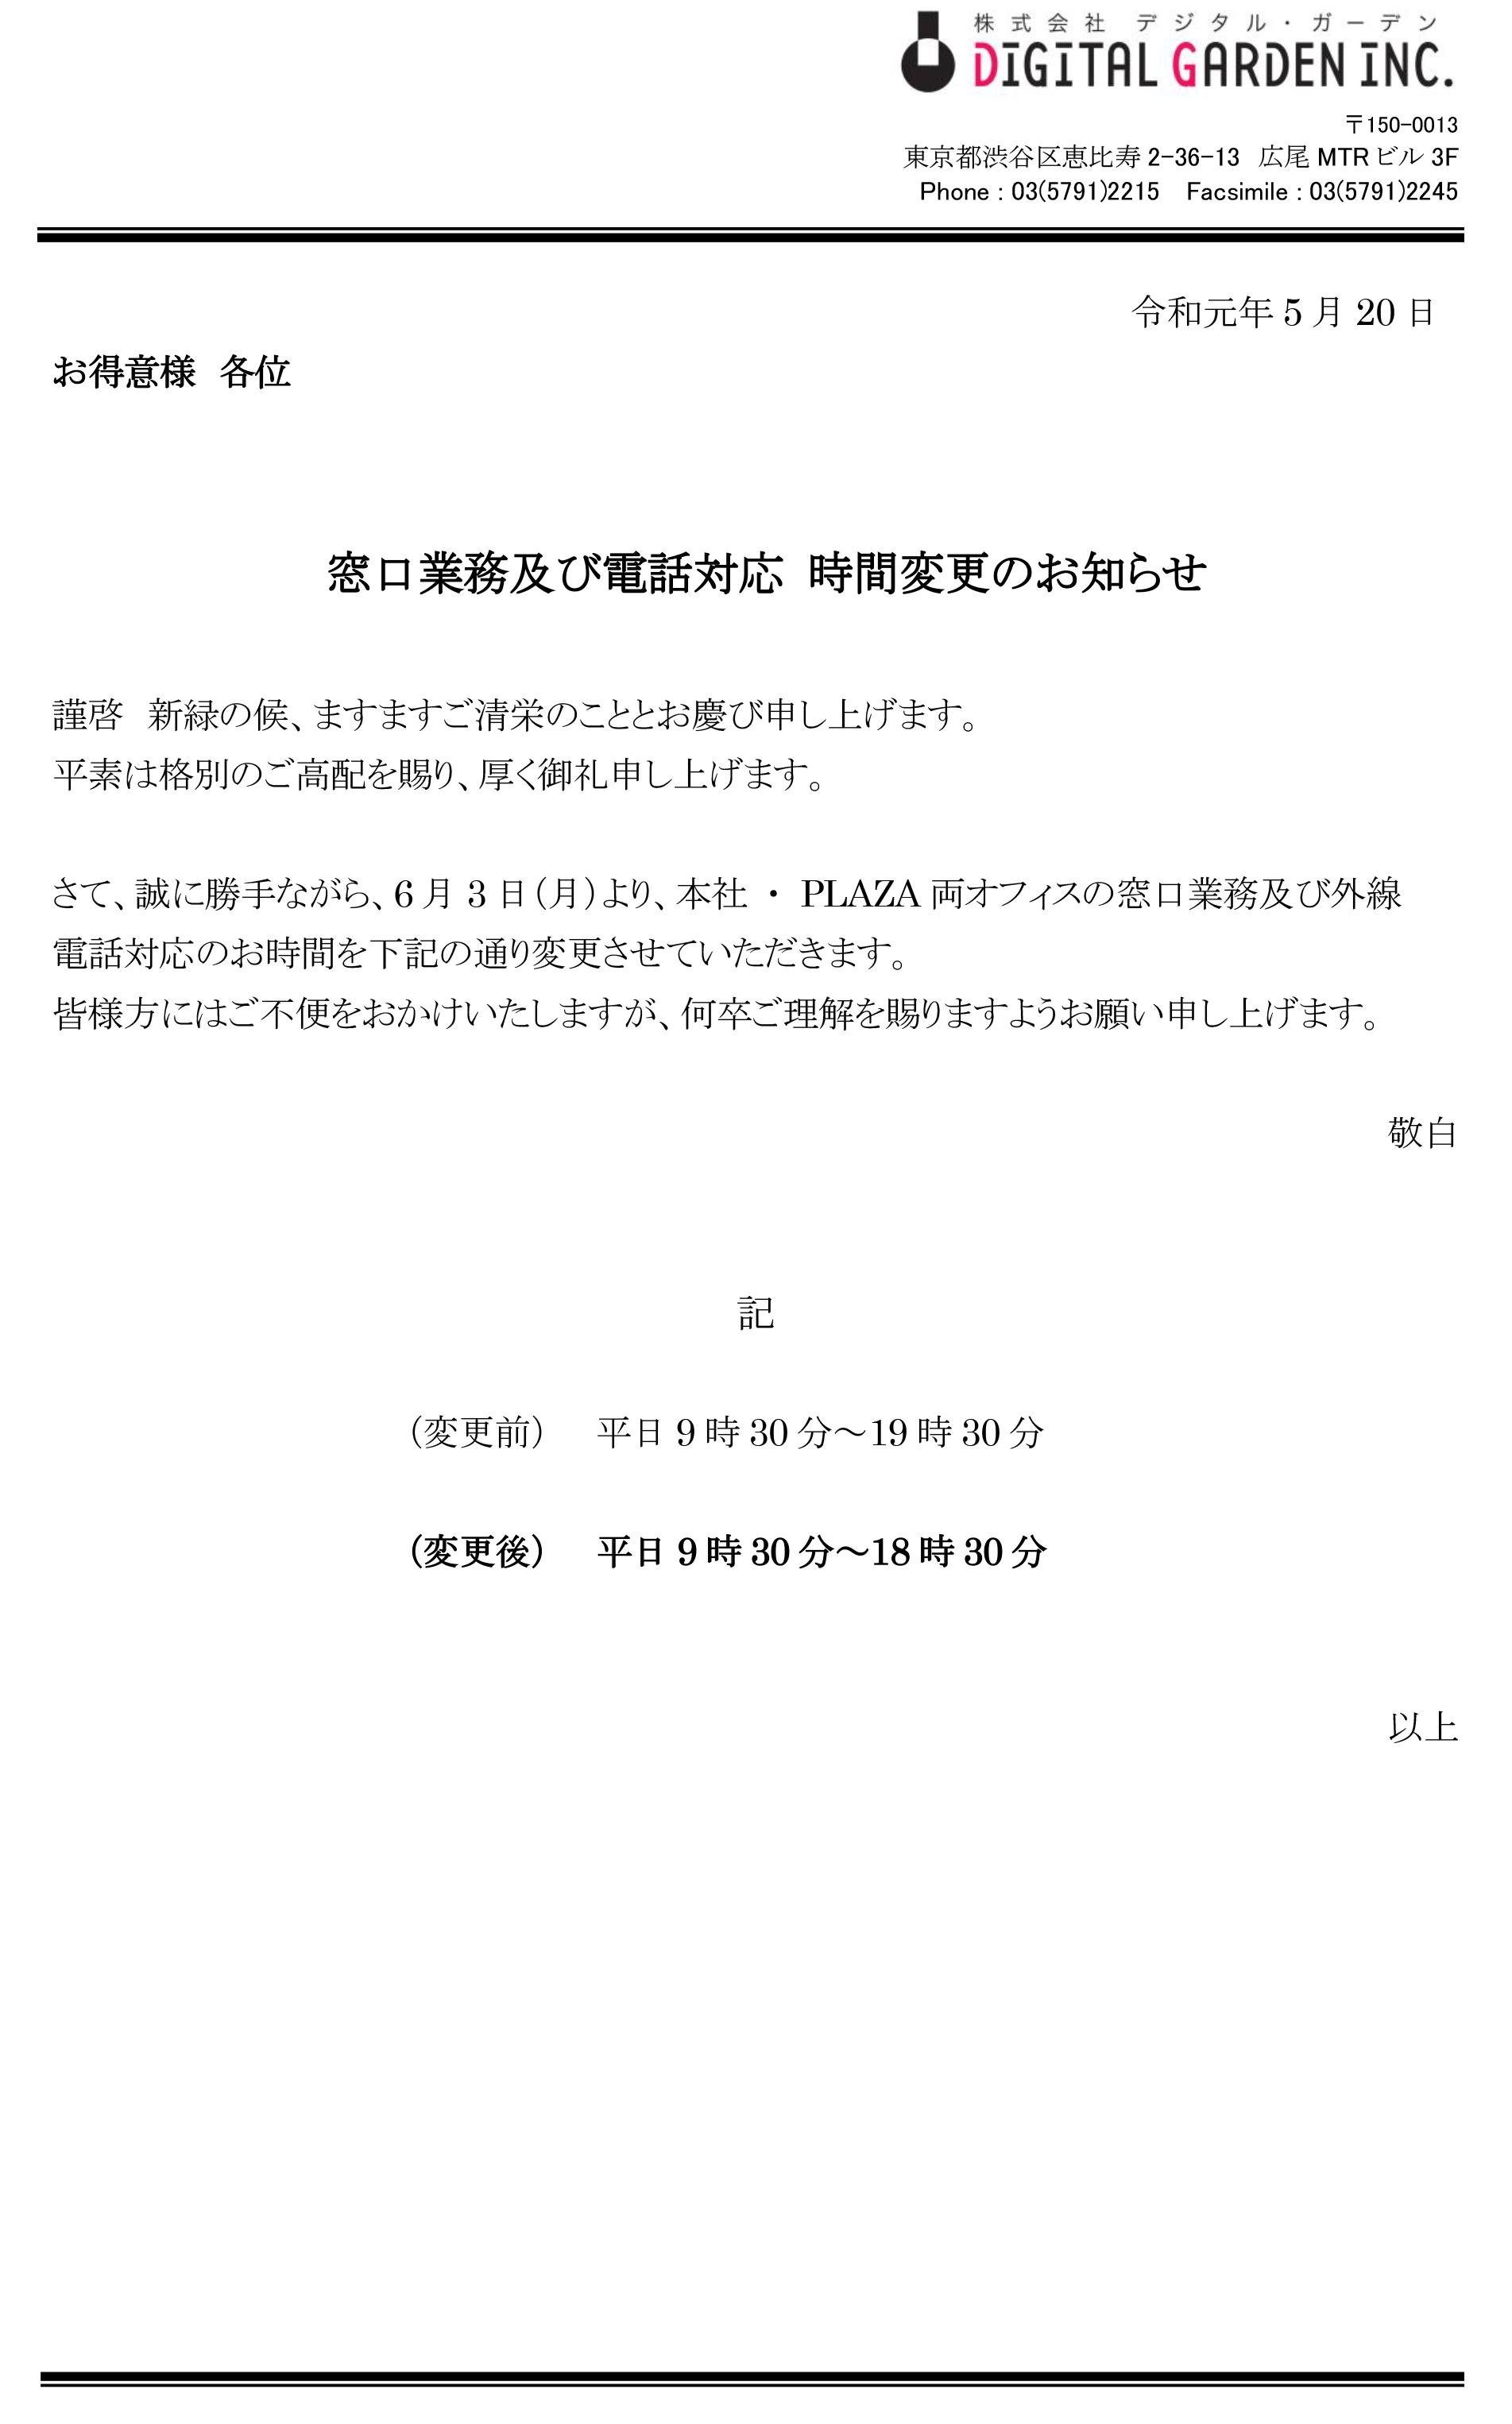 DGI_窓口対応時間変更のお知らせ20190520